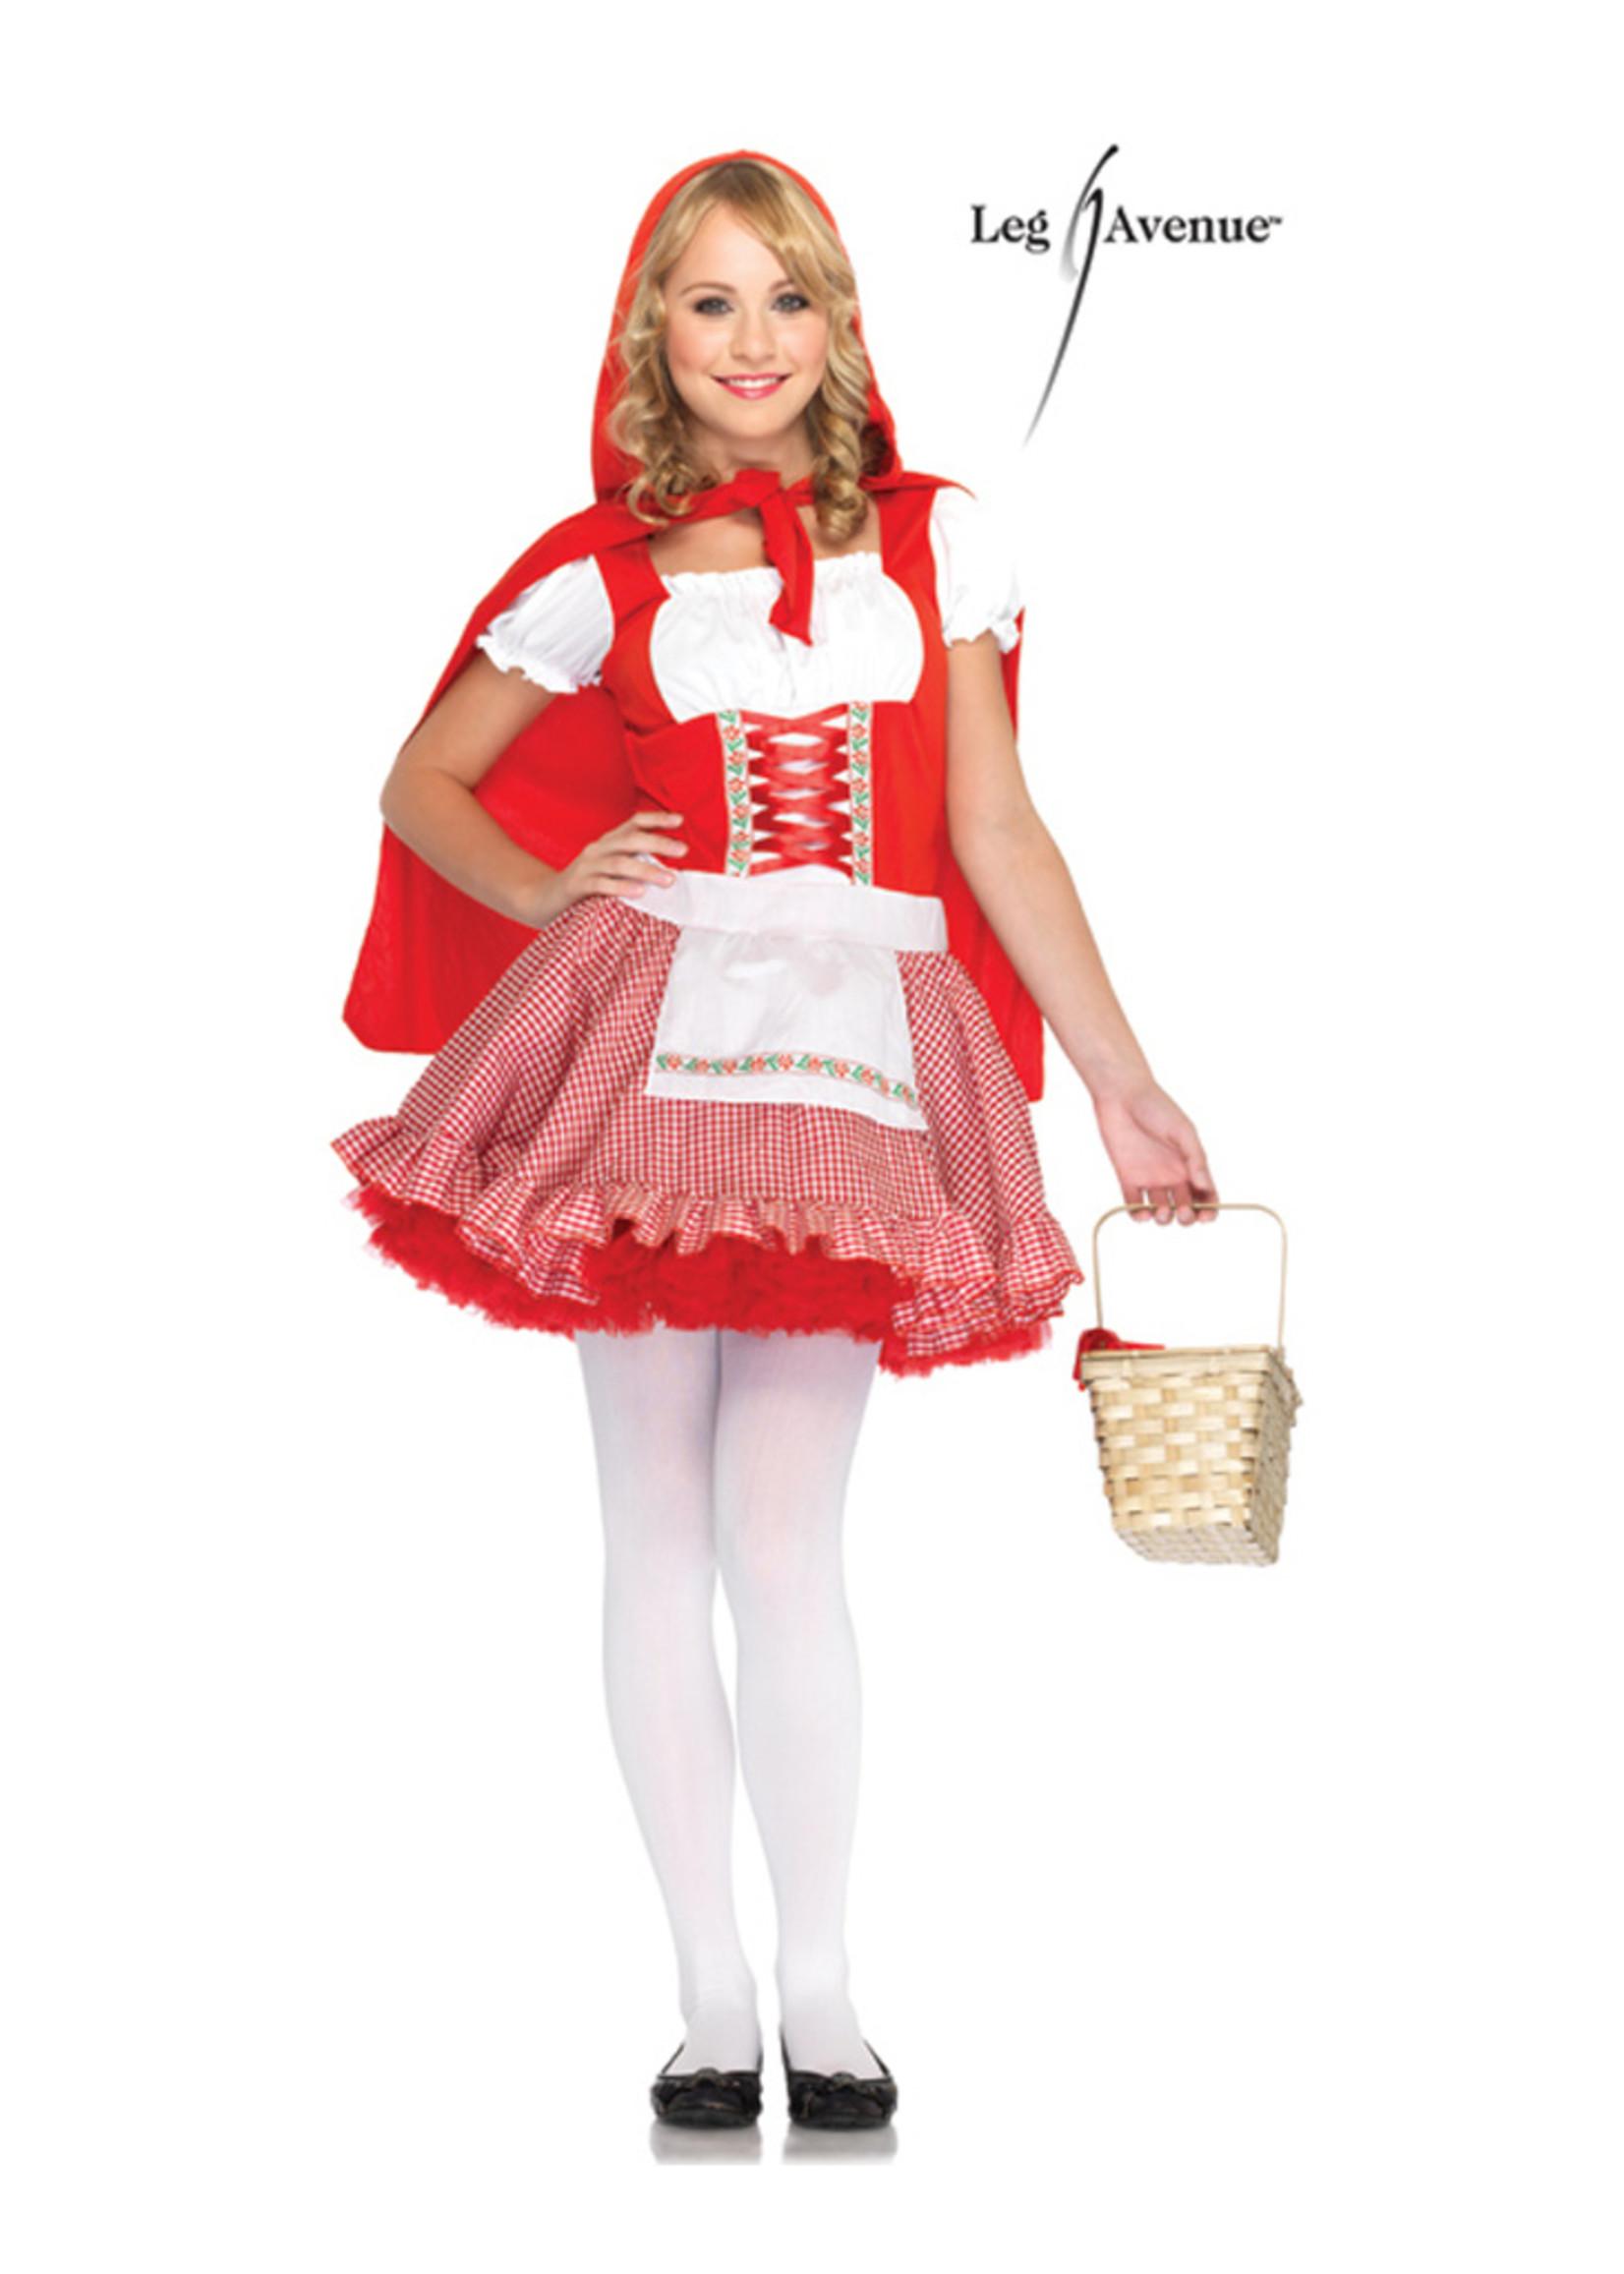 Lil' Miss Red Costume - Junior